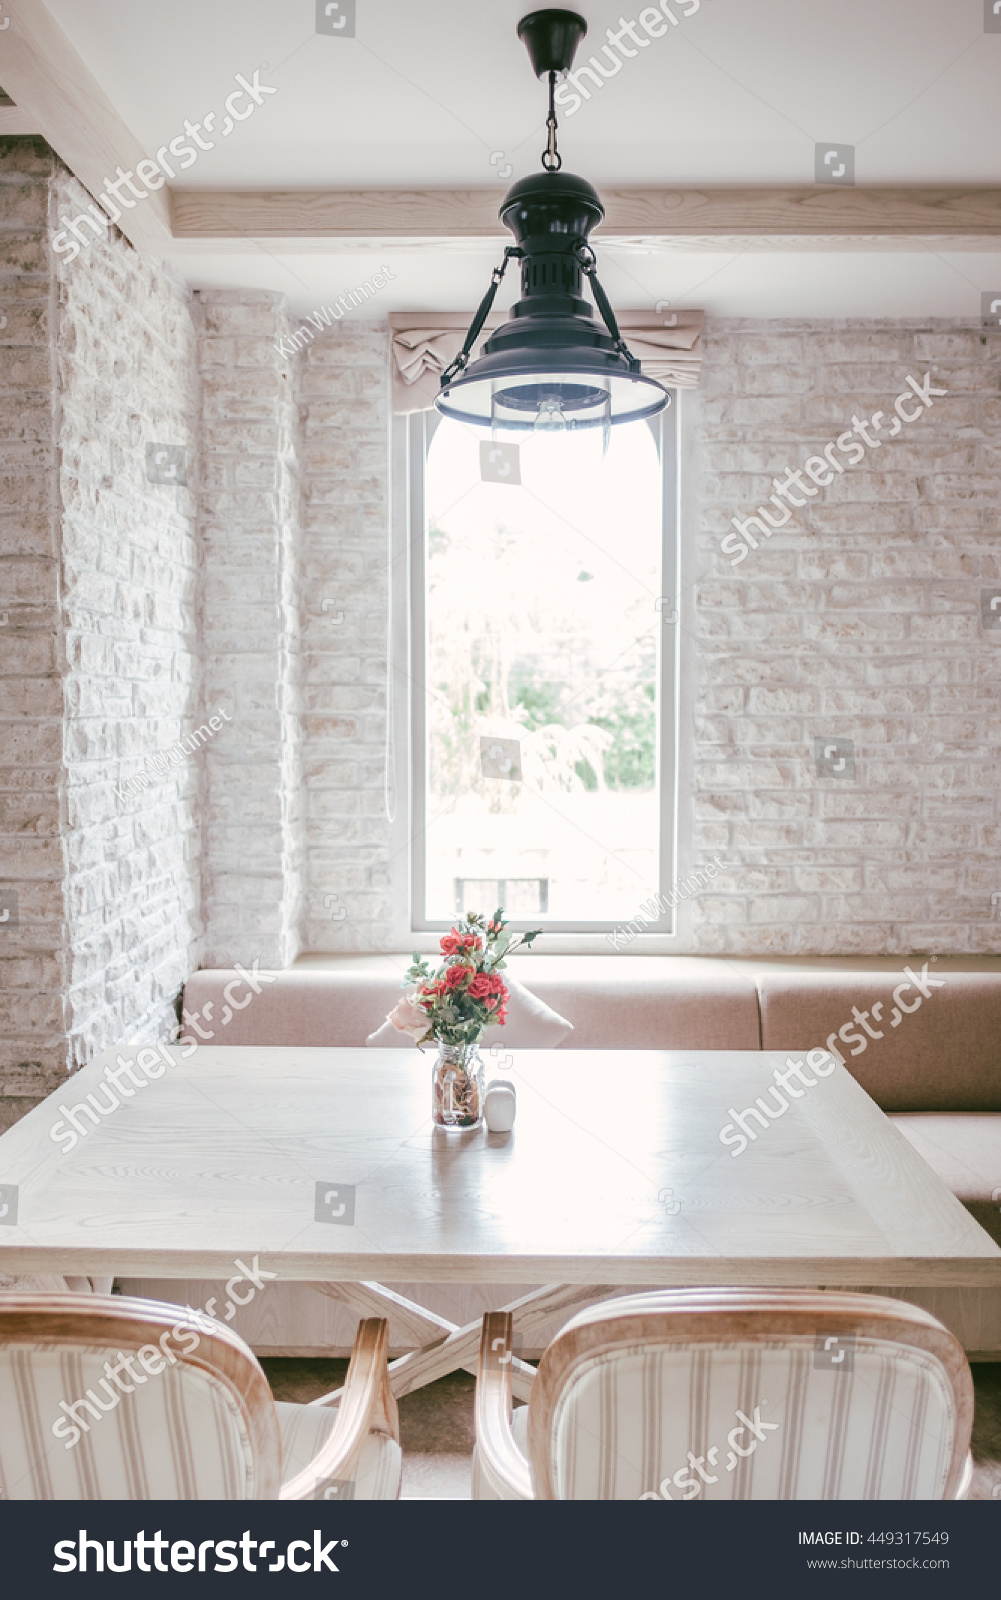 Luxury Vintage Marble Table Decoration Flower Stock Photo Edit Now 449317549